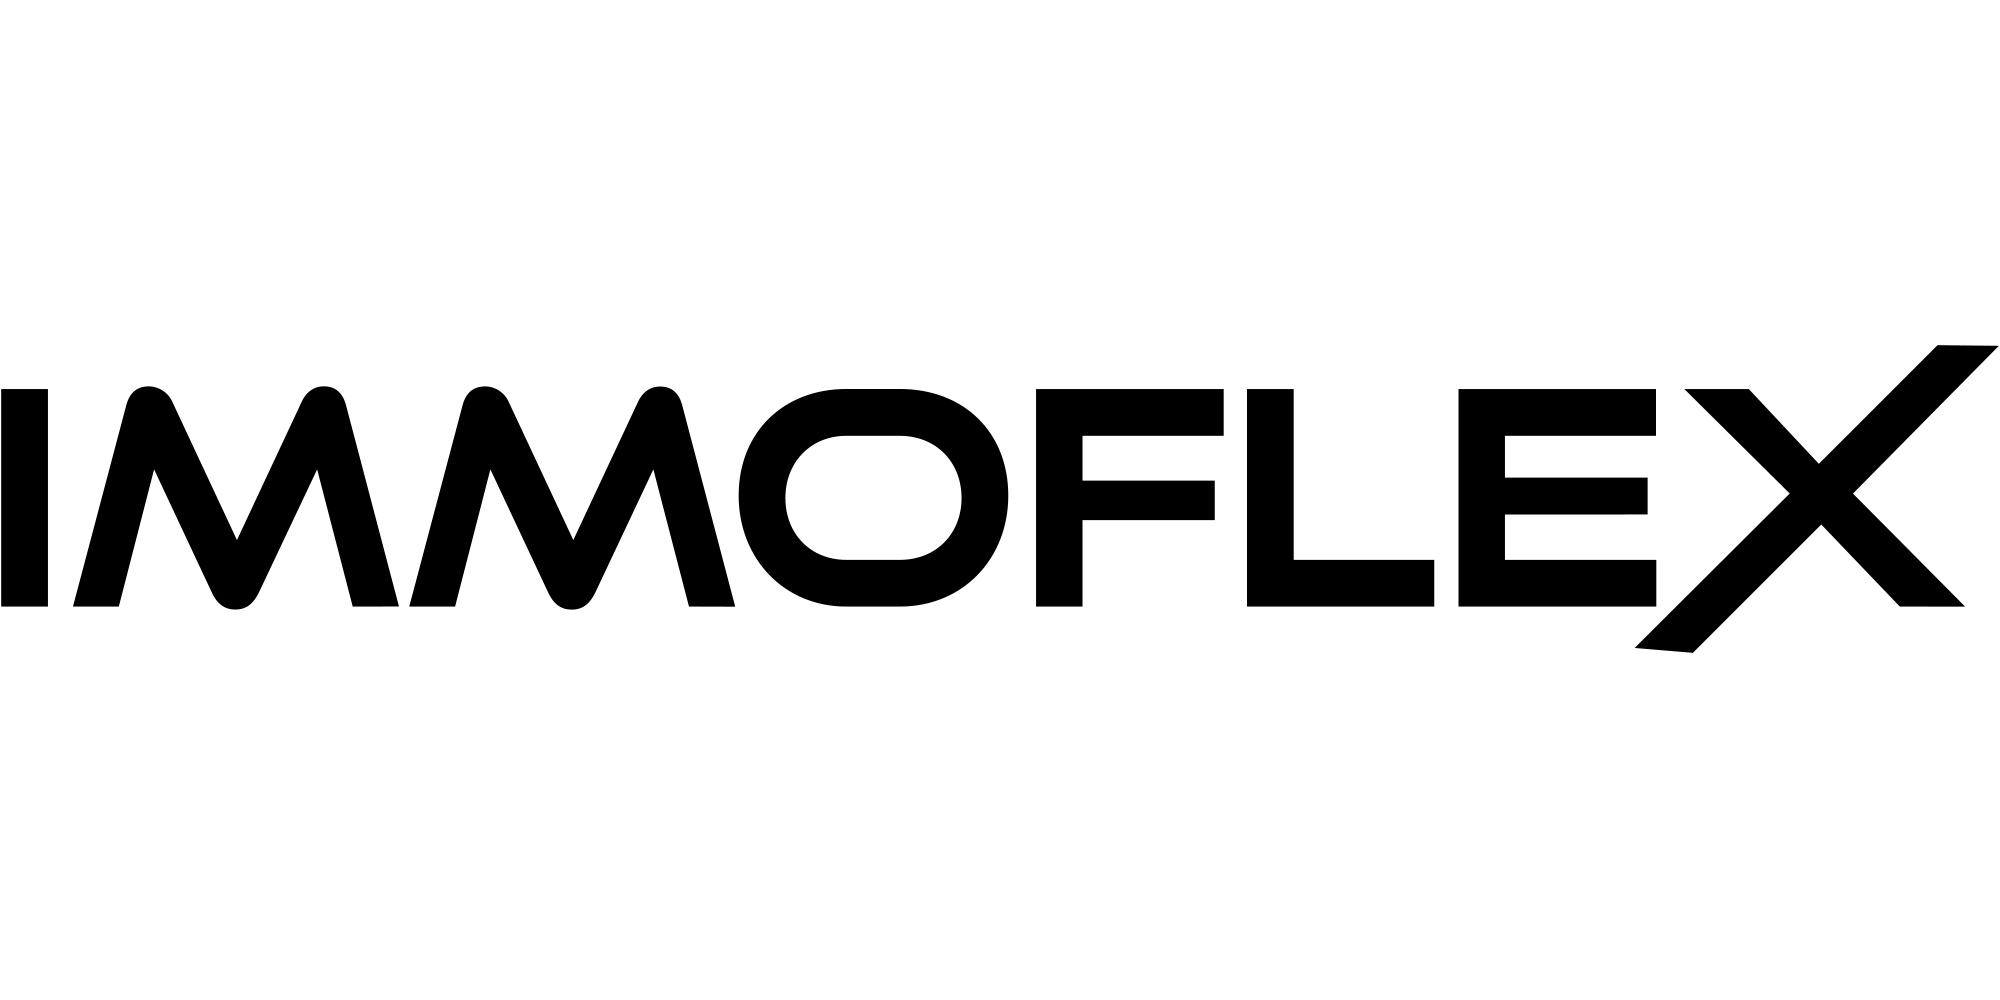 Immoflex logo